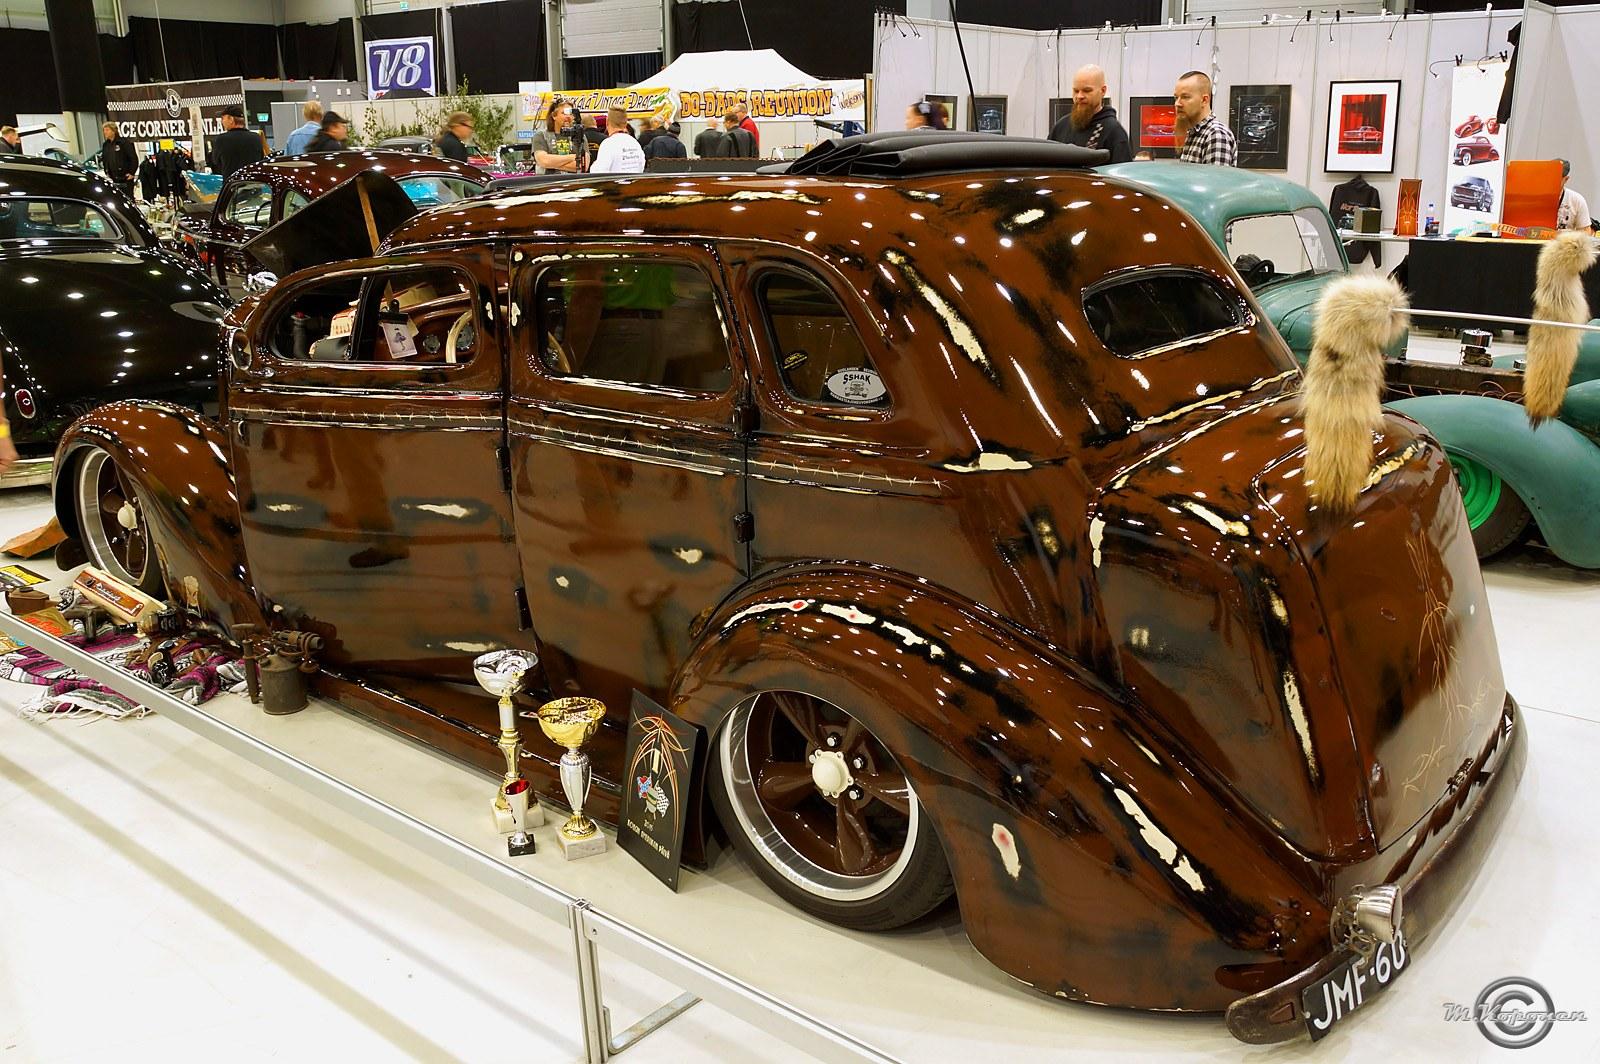 Car Show 2015 >> Xtreme Car Show 2015